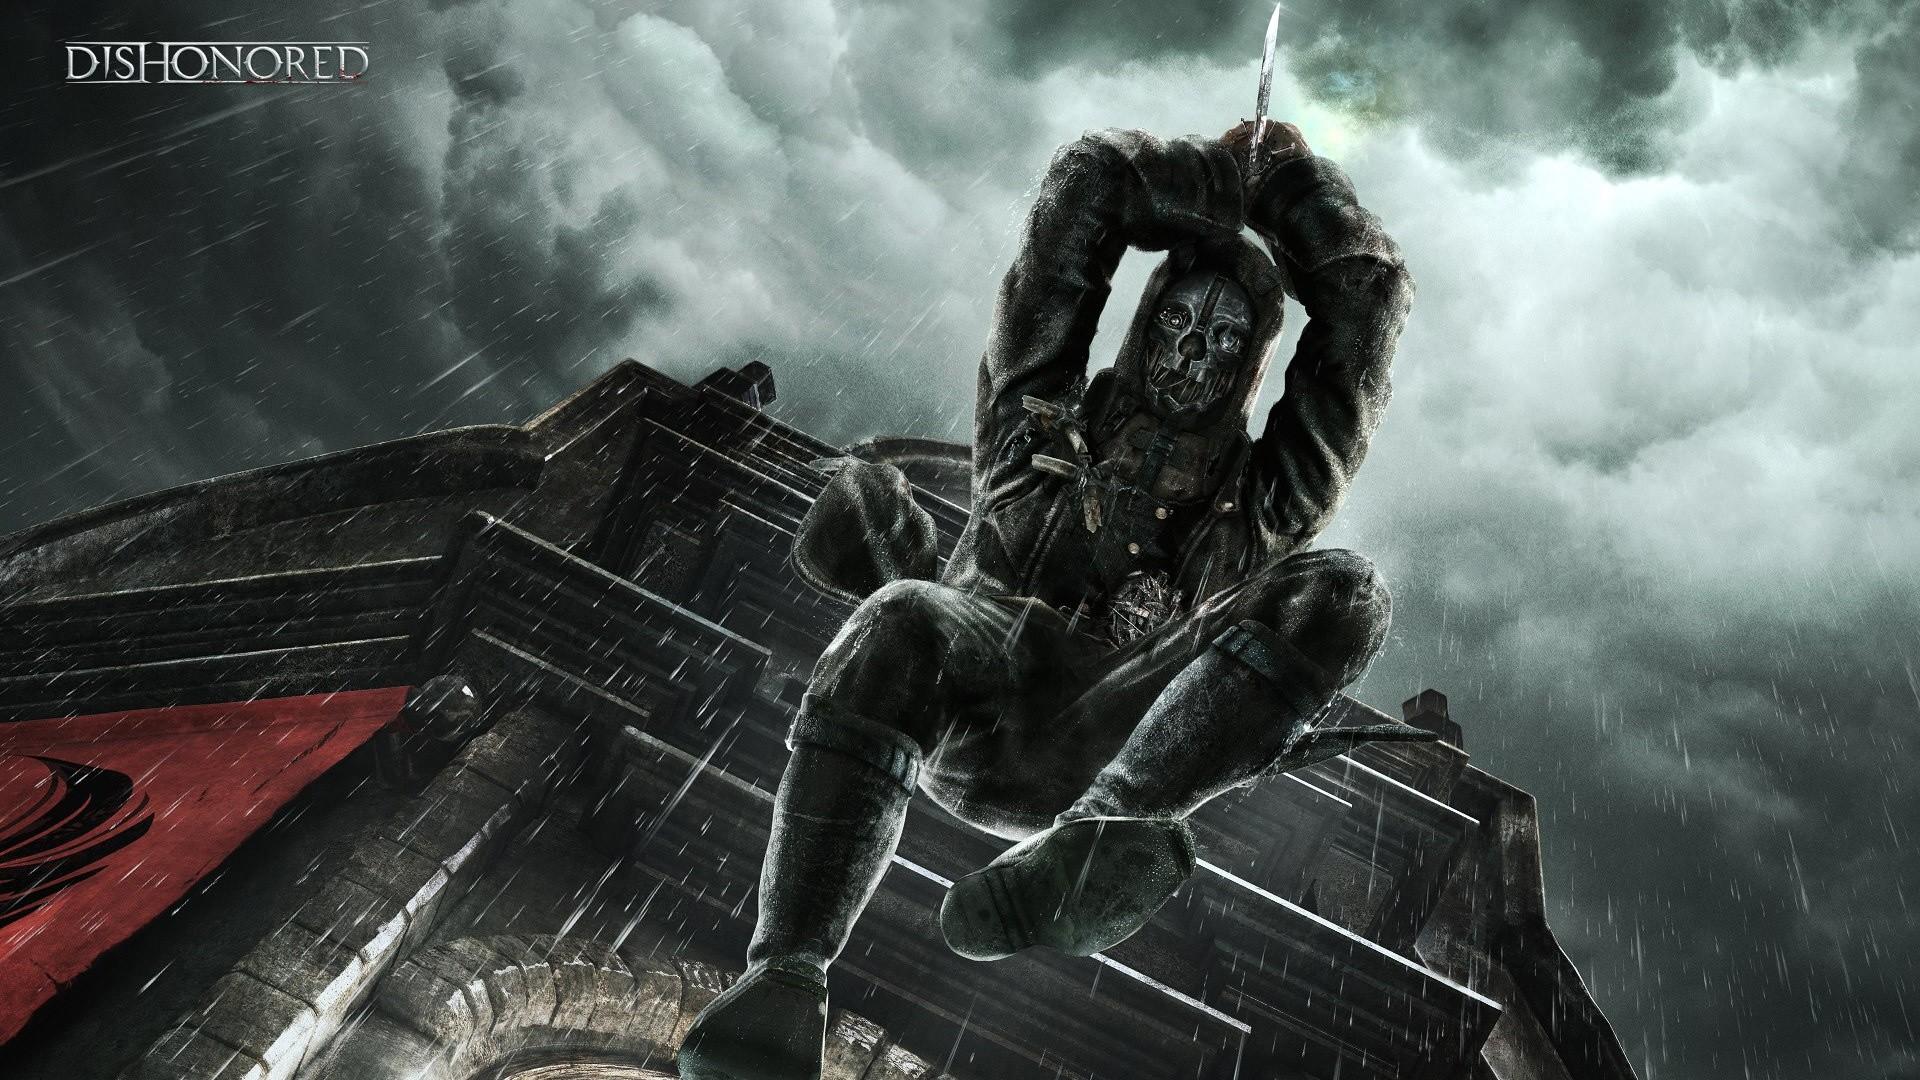 wallpaper e fotos em HD: dishonored video game